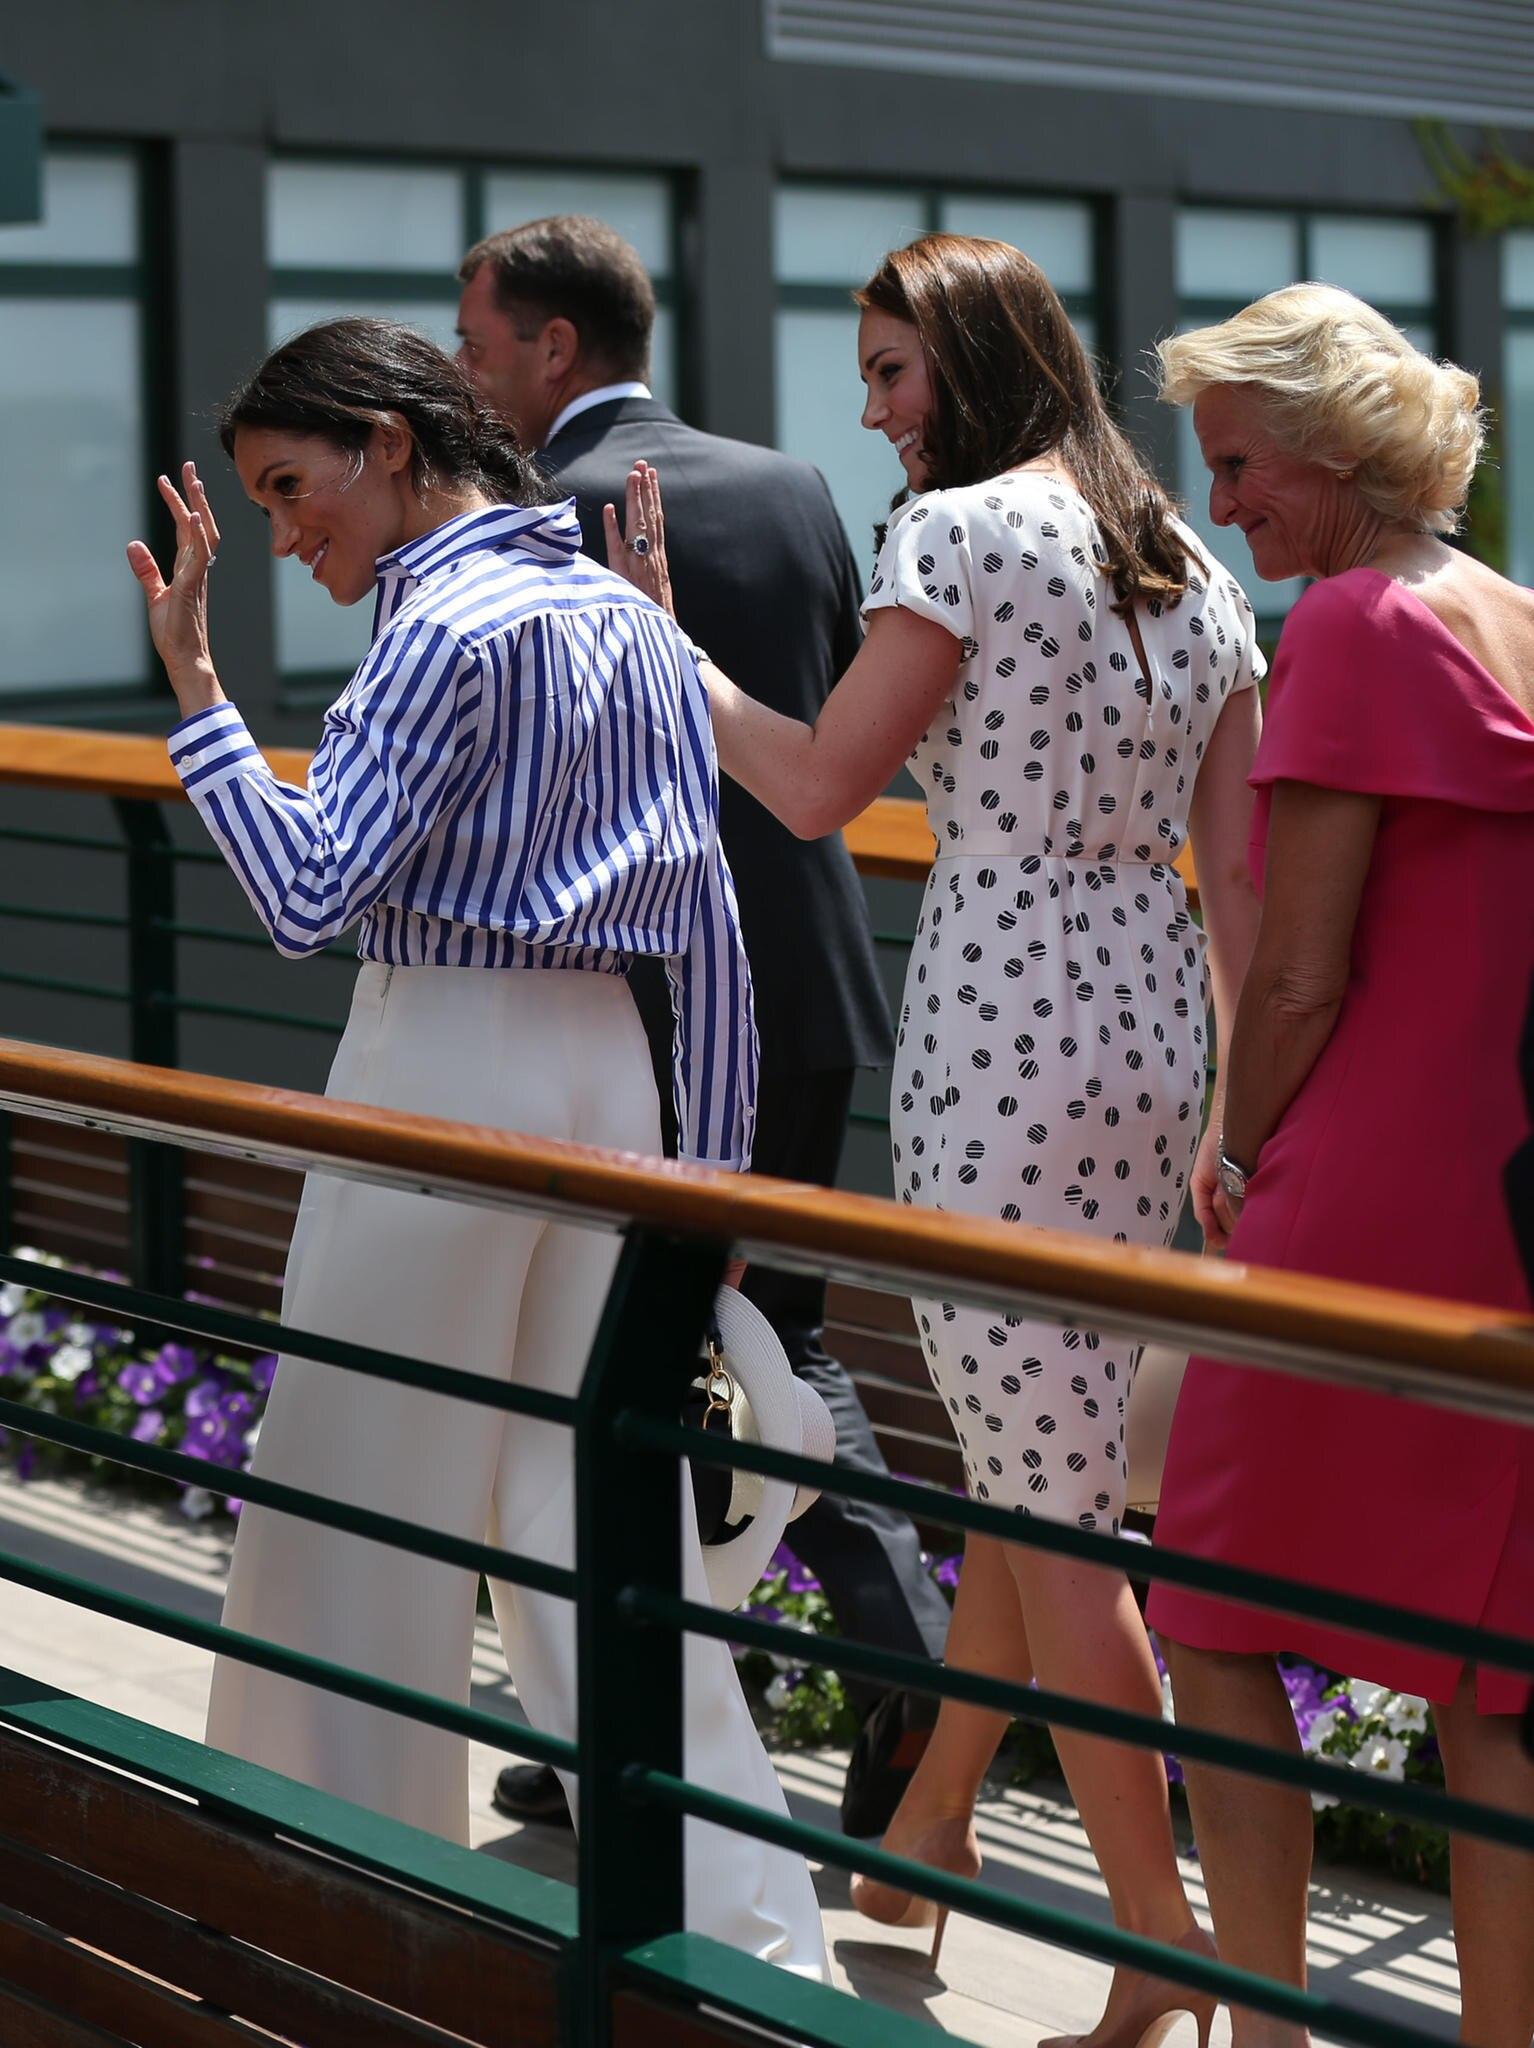 Winkend begrüßt das royale Duo die Fans in Wimbledon.